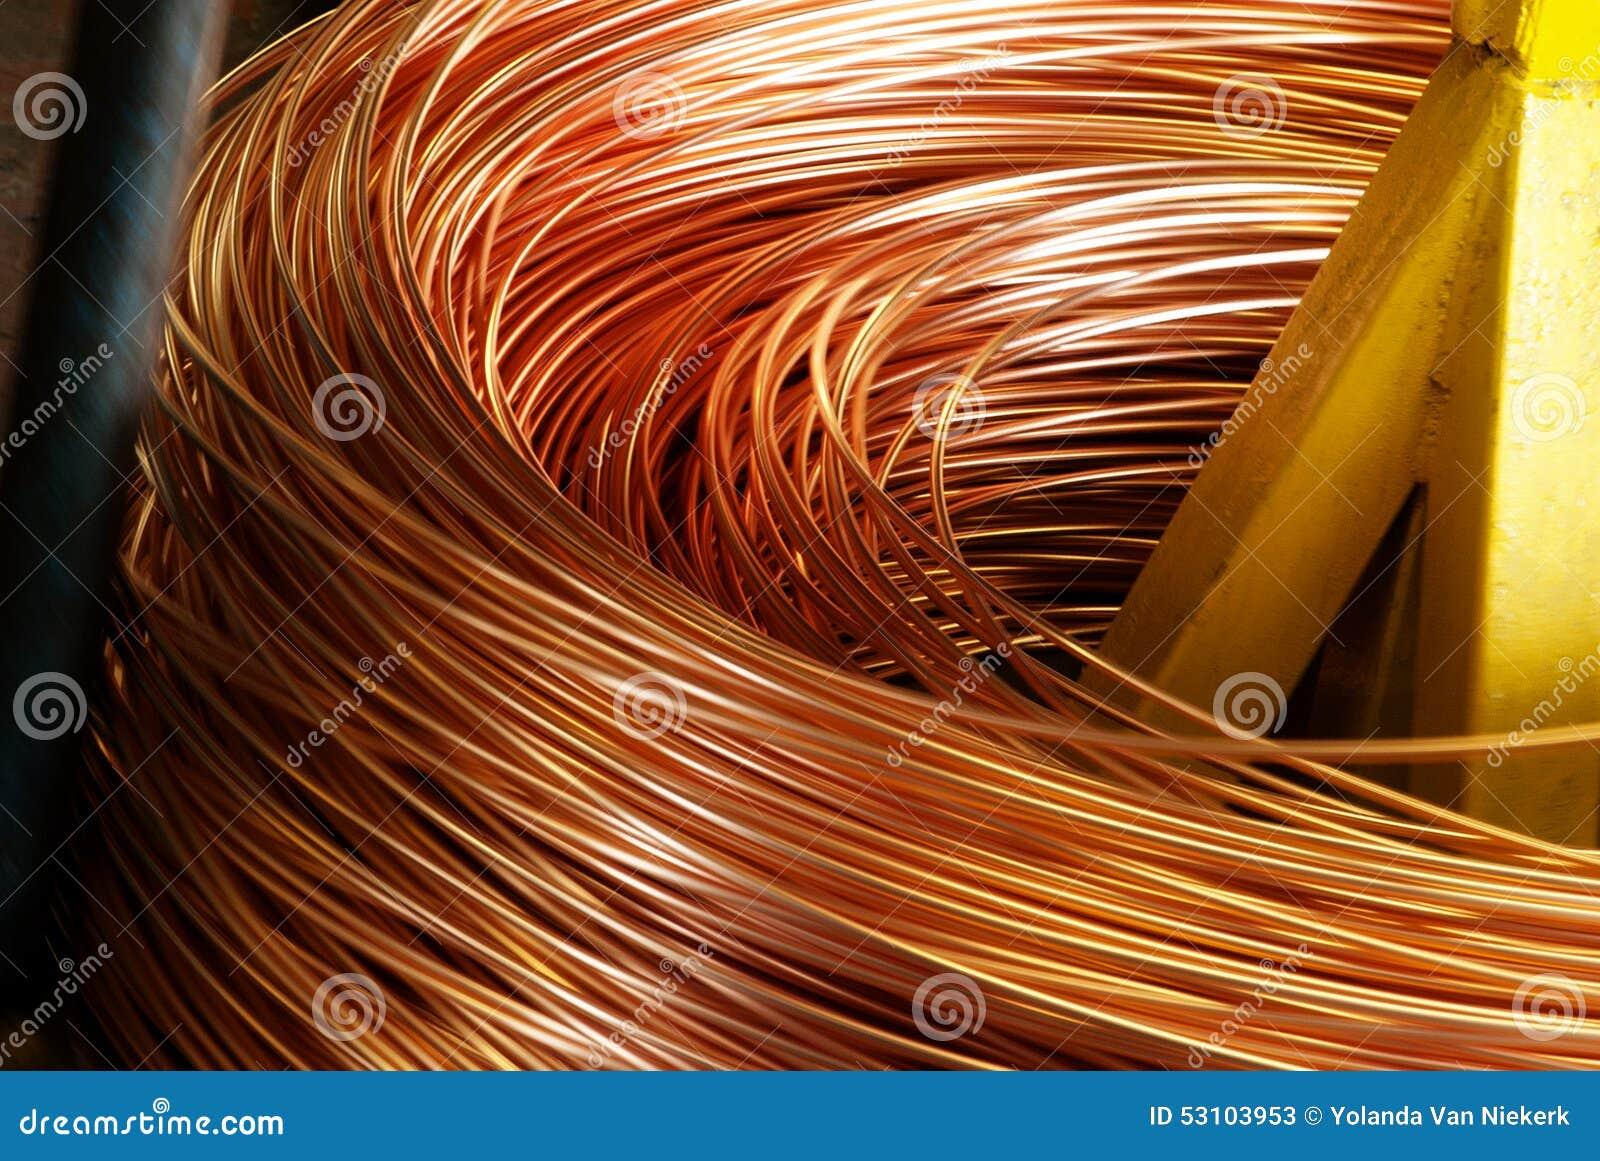 Primer del cable de cobre que es rodado para arriba